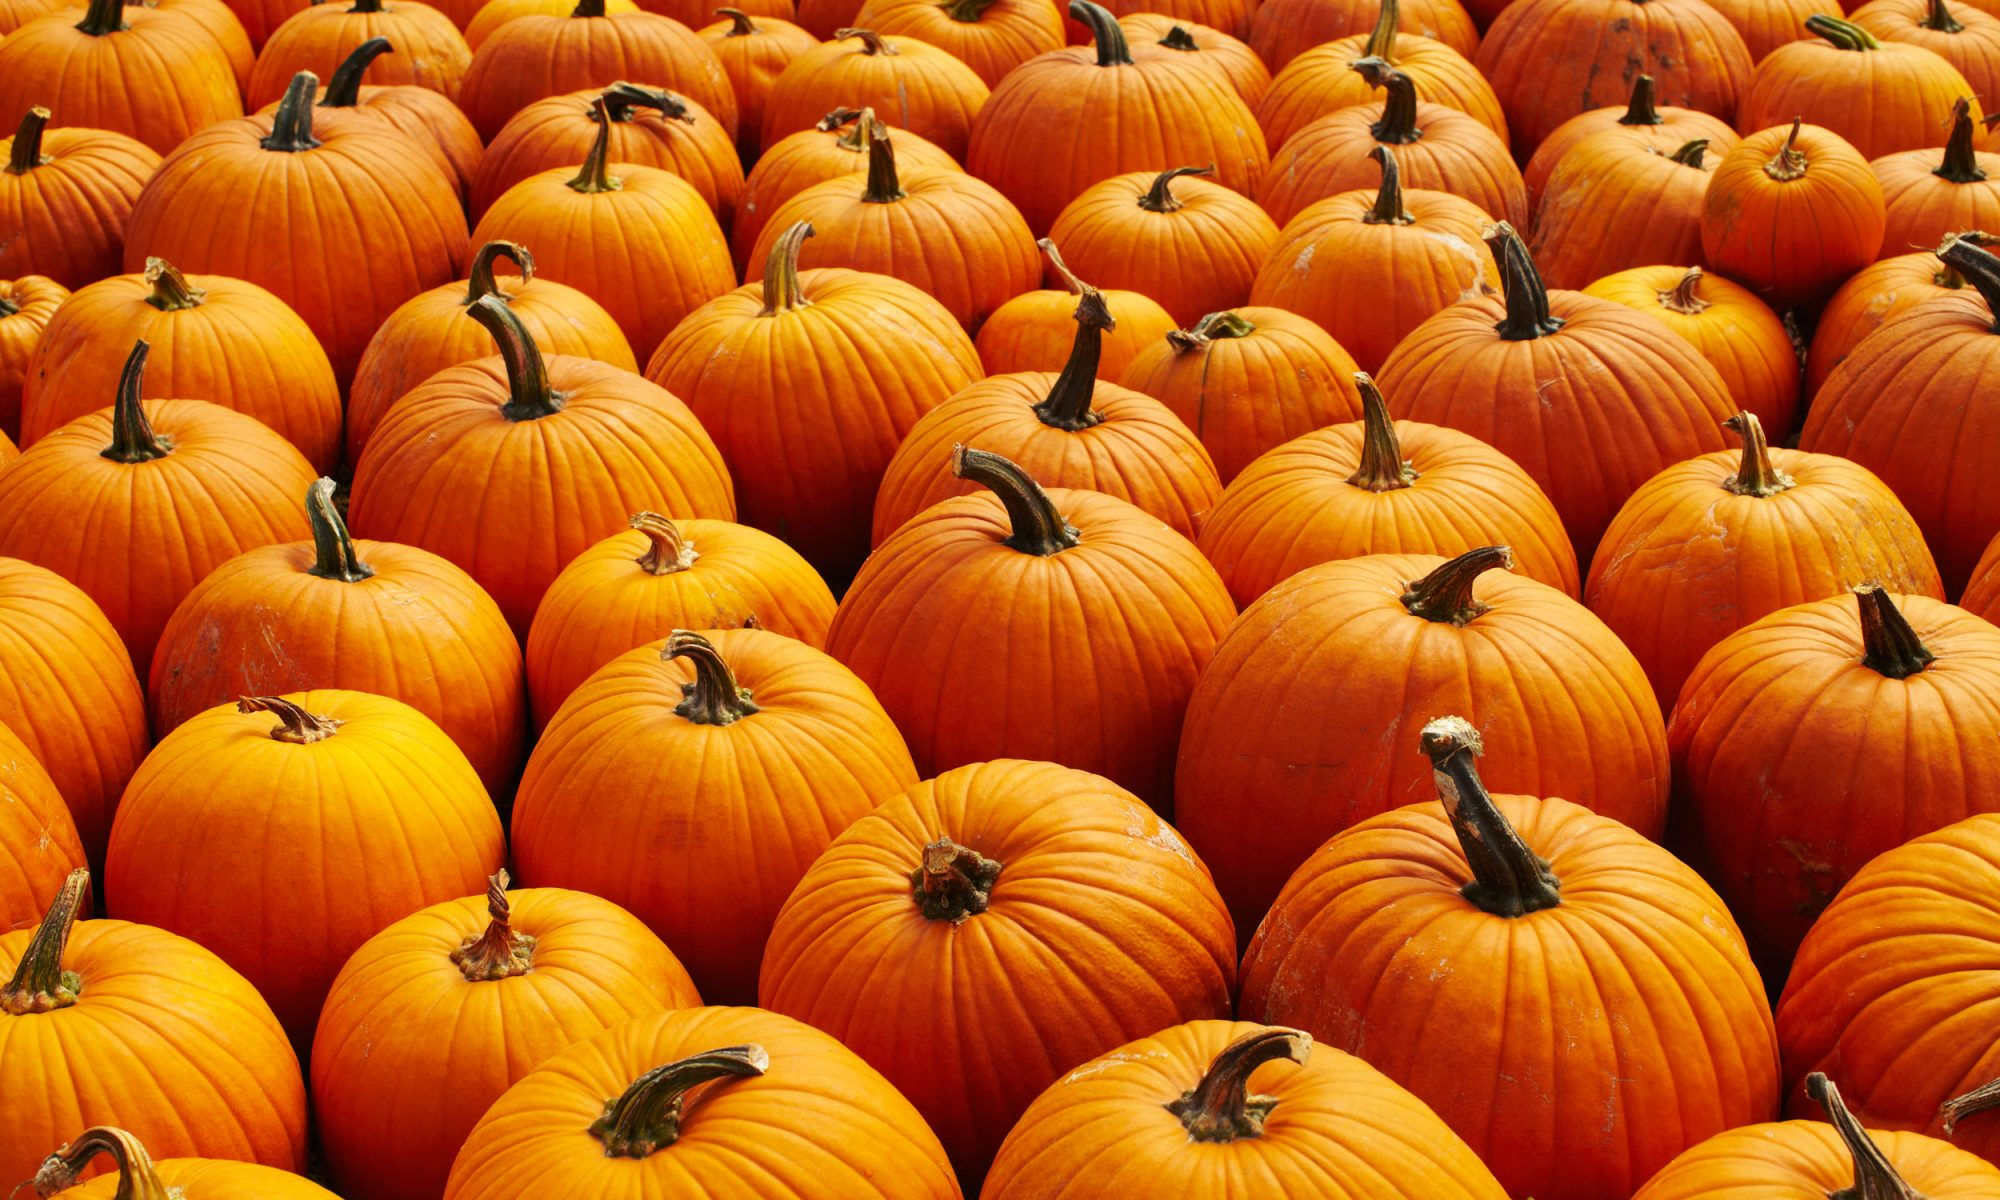 DIY Pumpkin Spice Body Scrub Will Have You Smelling Like Fall